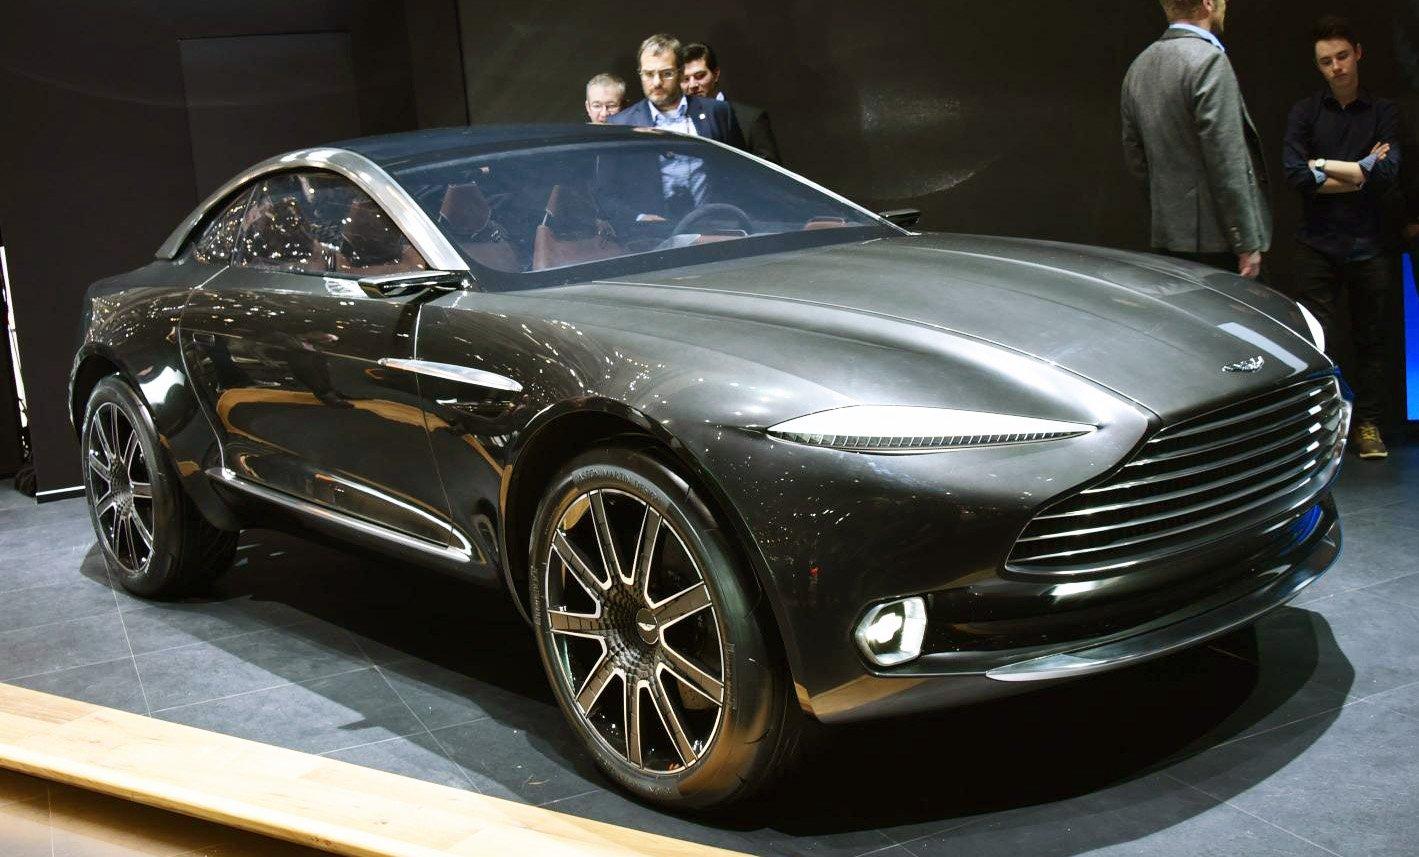 aston martin dbx concept awd electric bond car image 316279. Black Bedroom Furniture Sets. Home Design Ideas